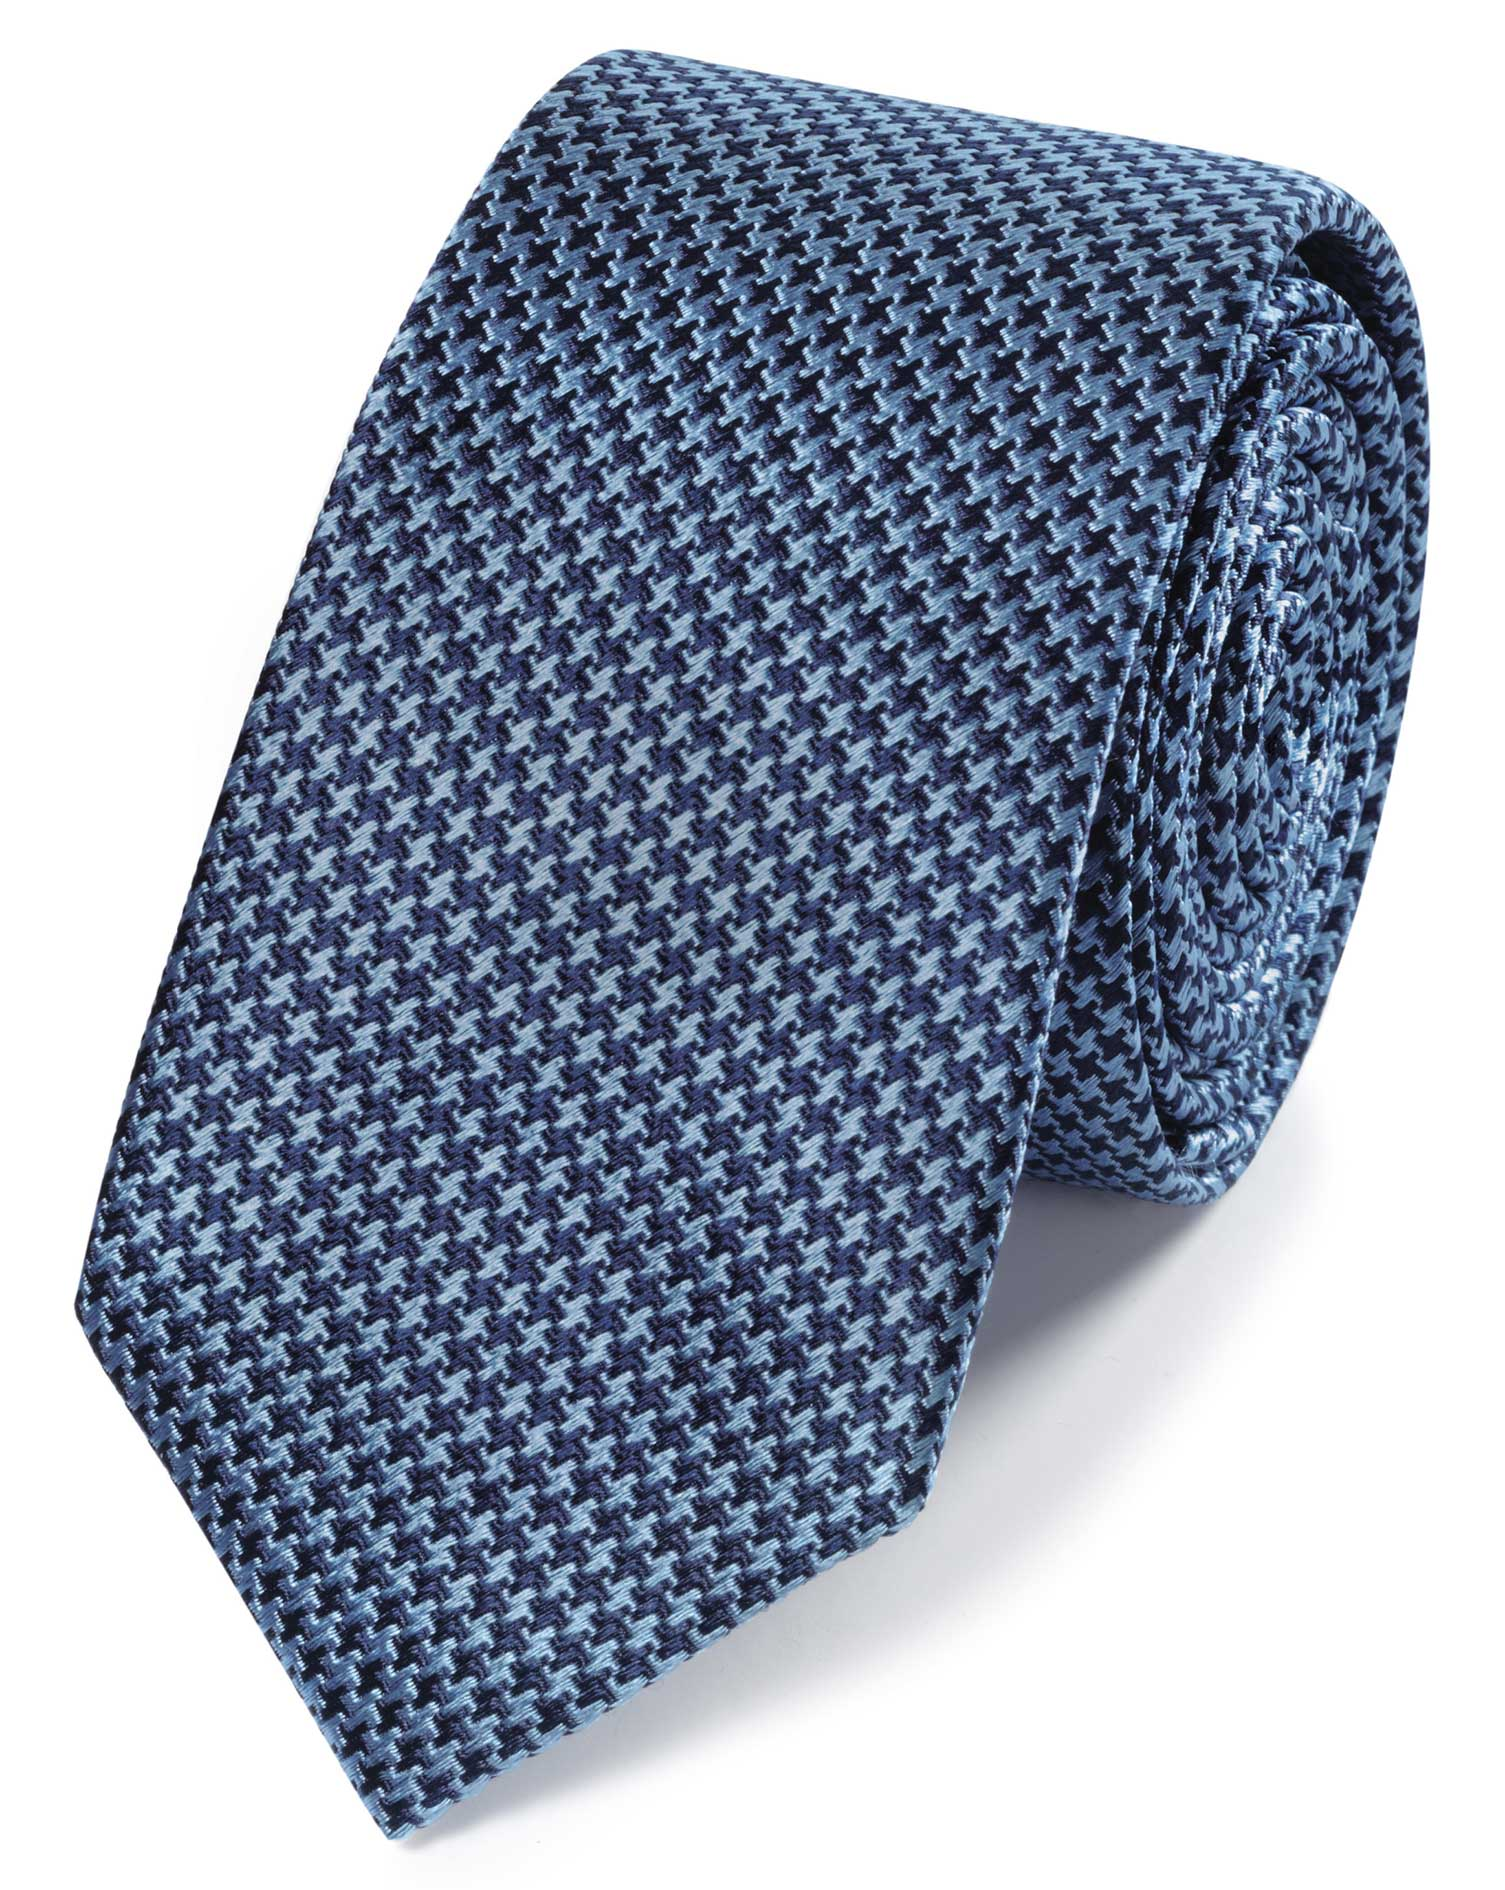 Sky Blue and Navy Mini Puppytooth Slim Silk Tie Size OSFA by Charles Tyrwhitt